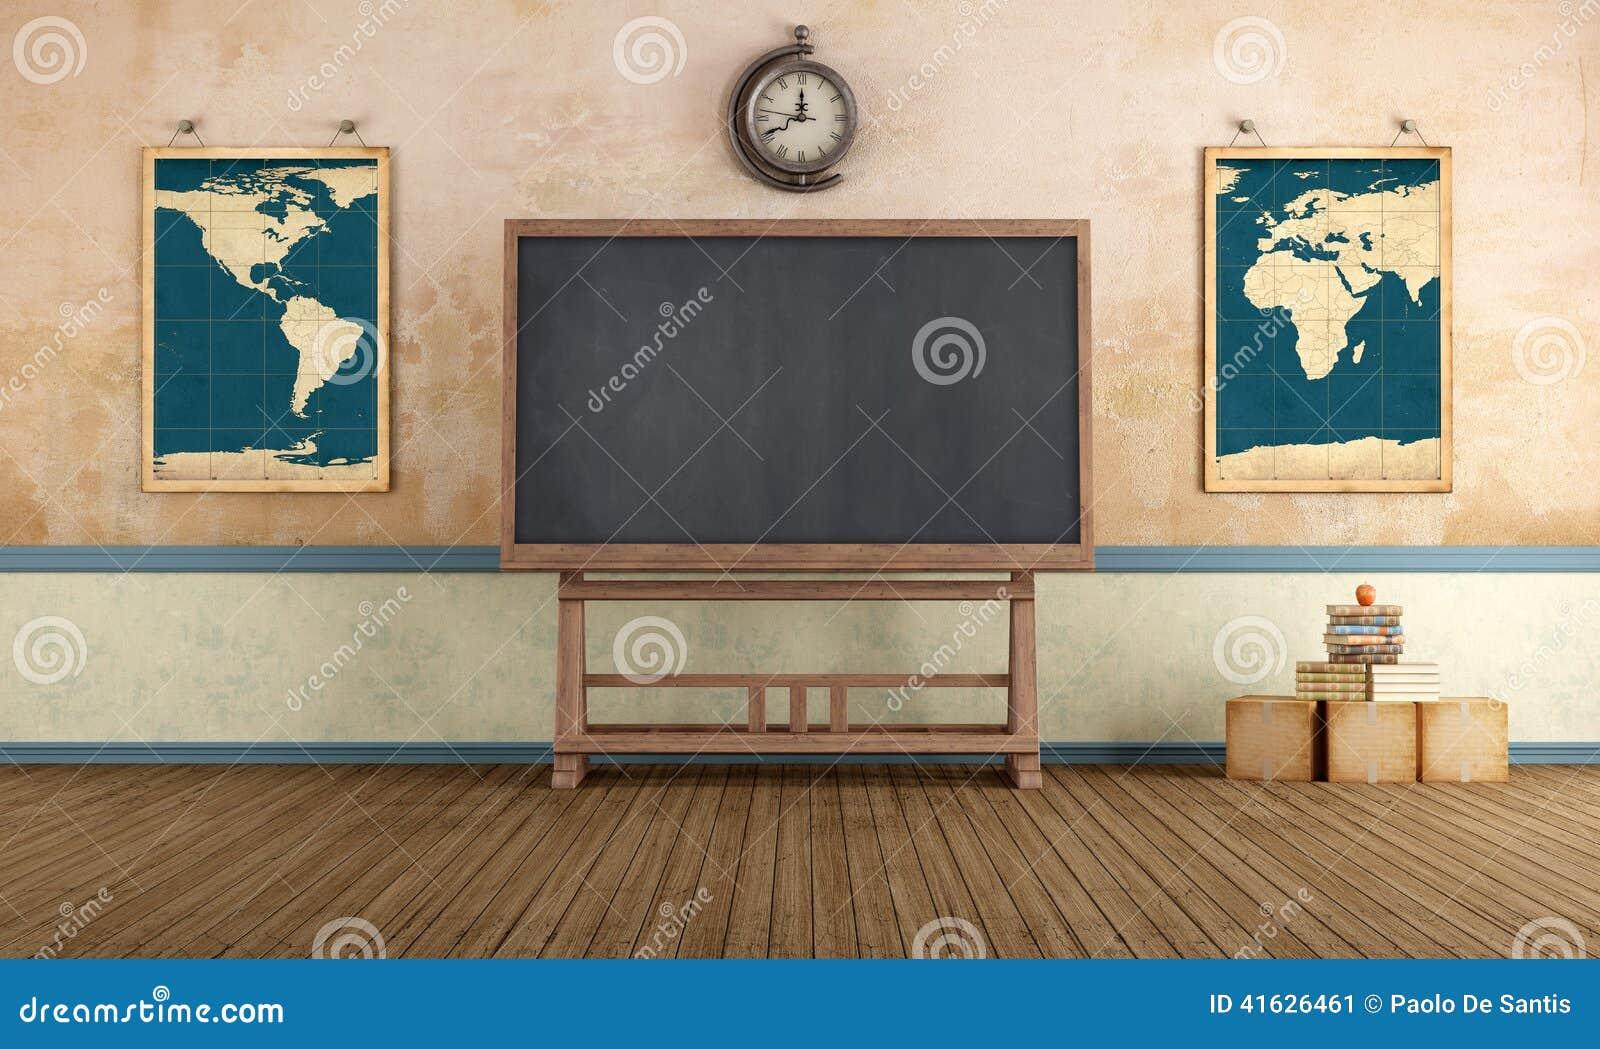 Classroom Blackboard Design ~ Vintage classroom stock illustration of